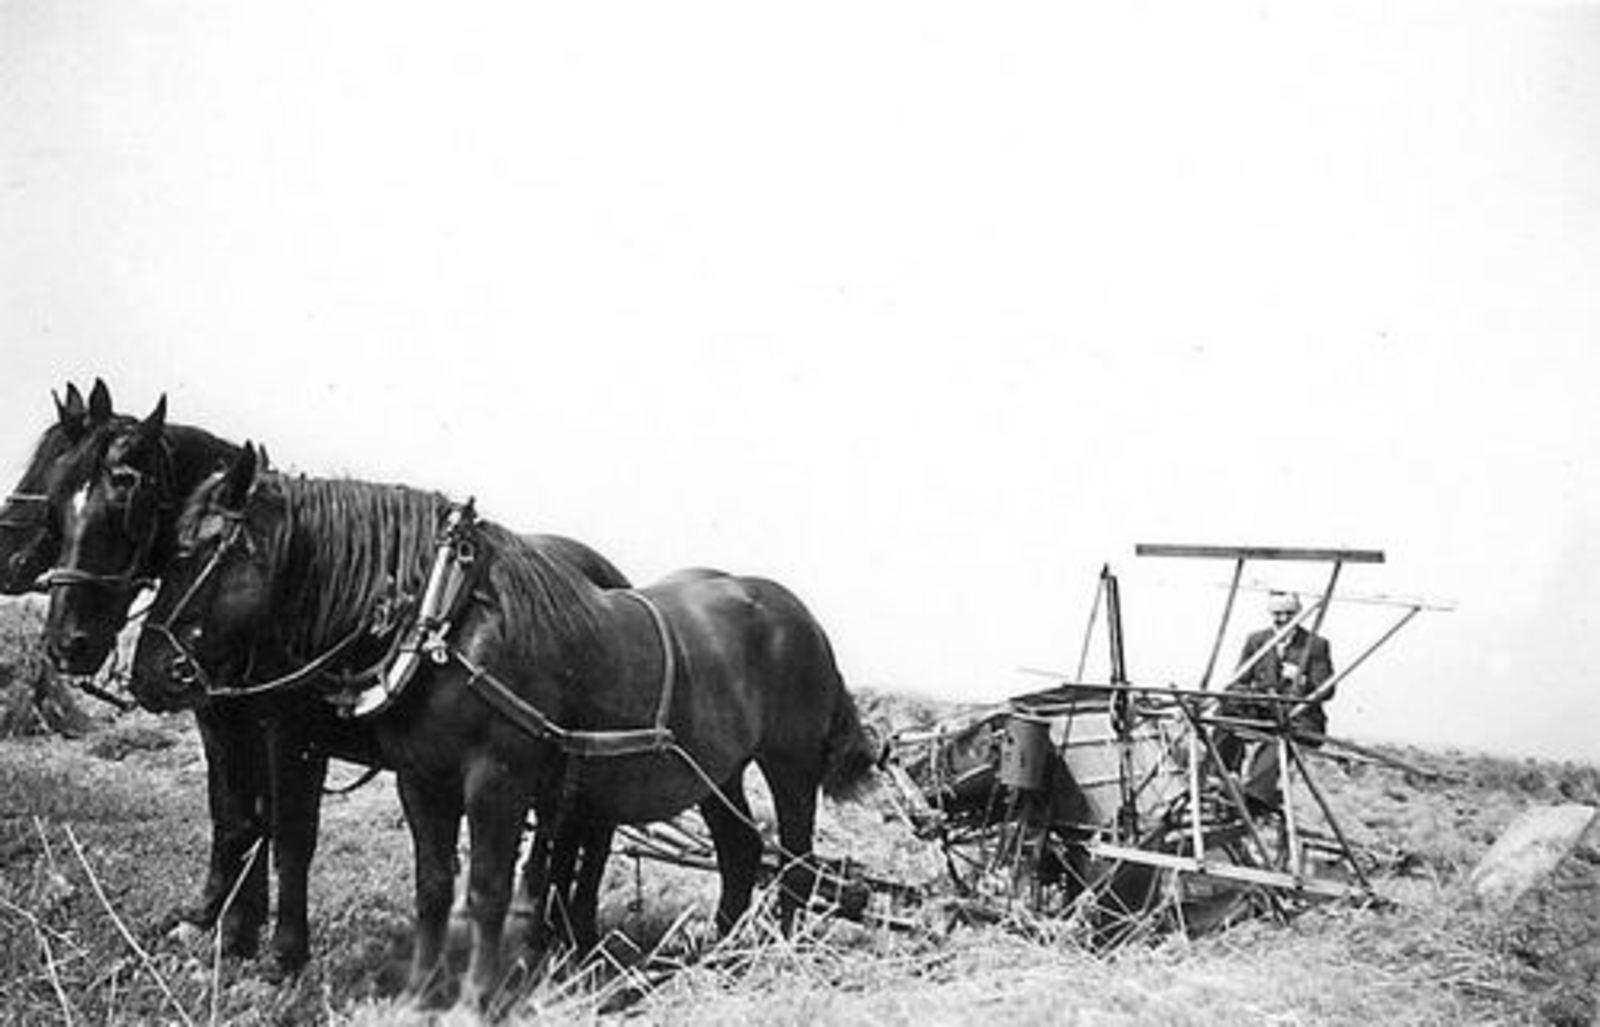 Koeckhoven Frans 1913 19__ Korenmaaien met 3-Span